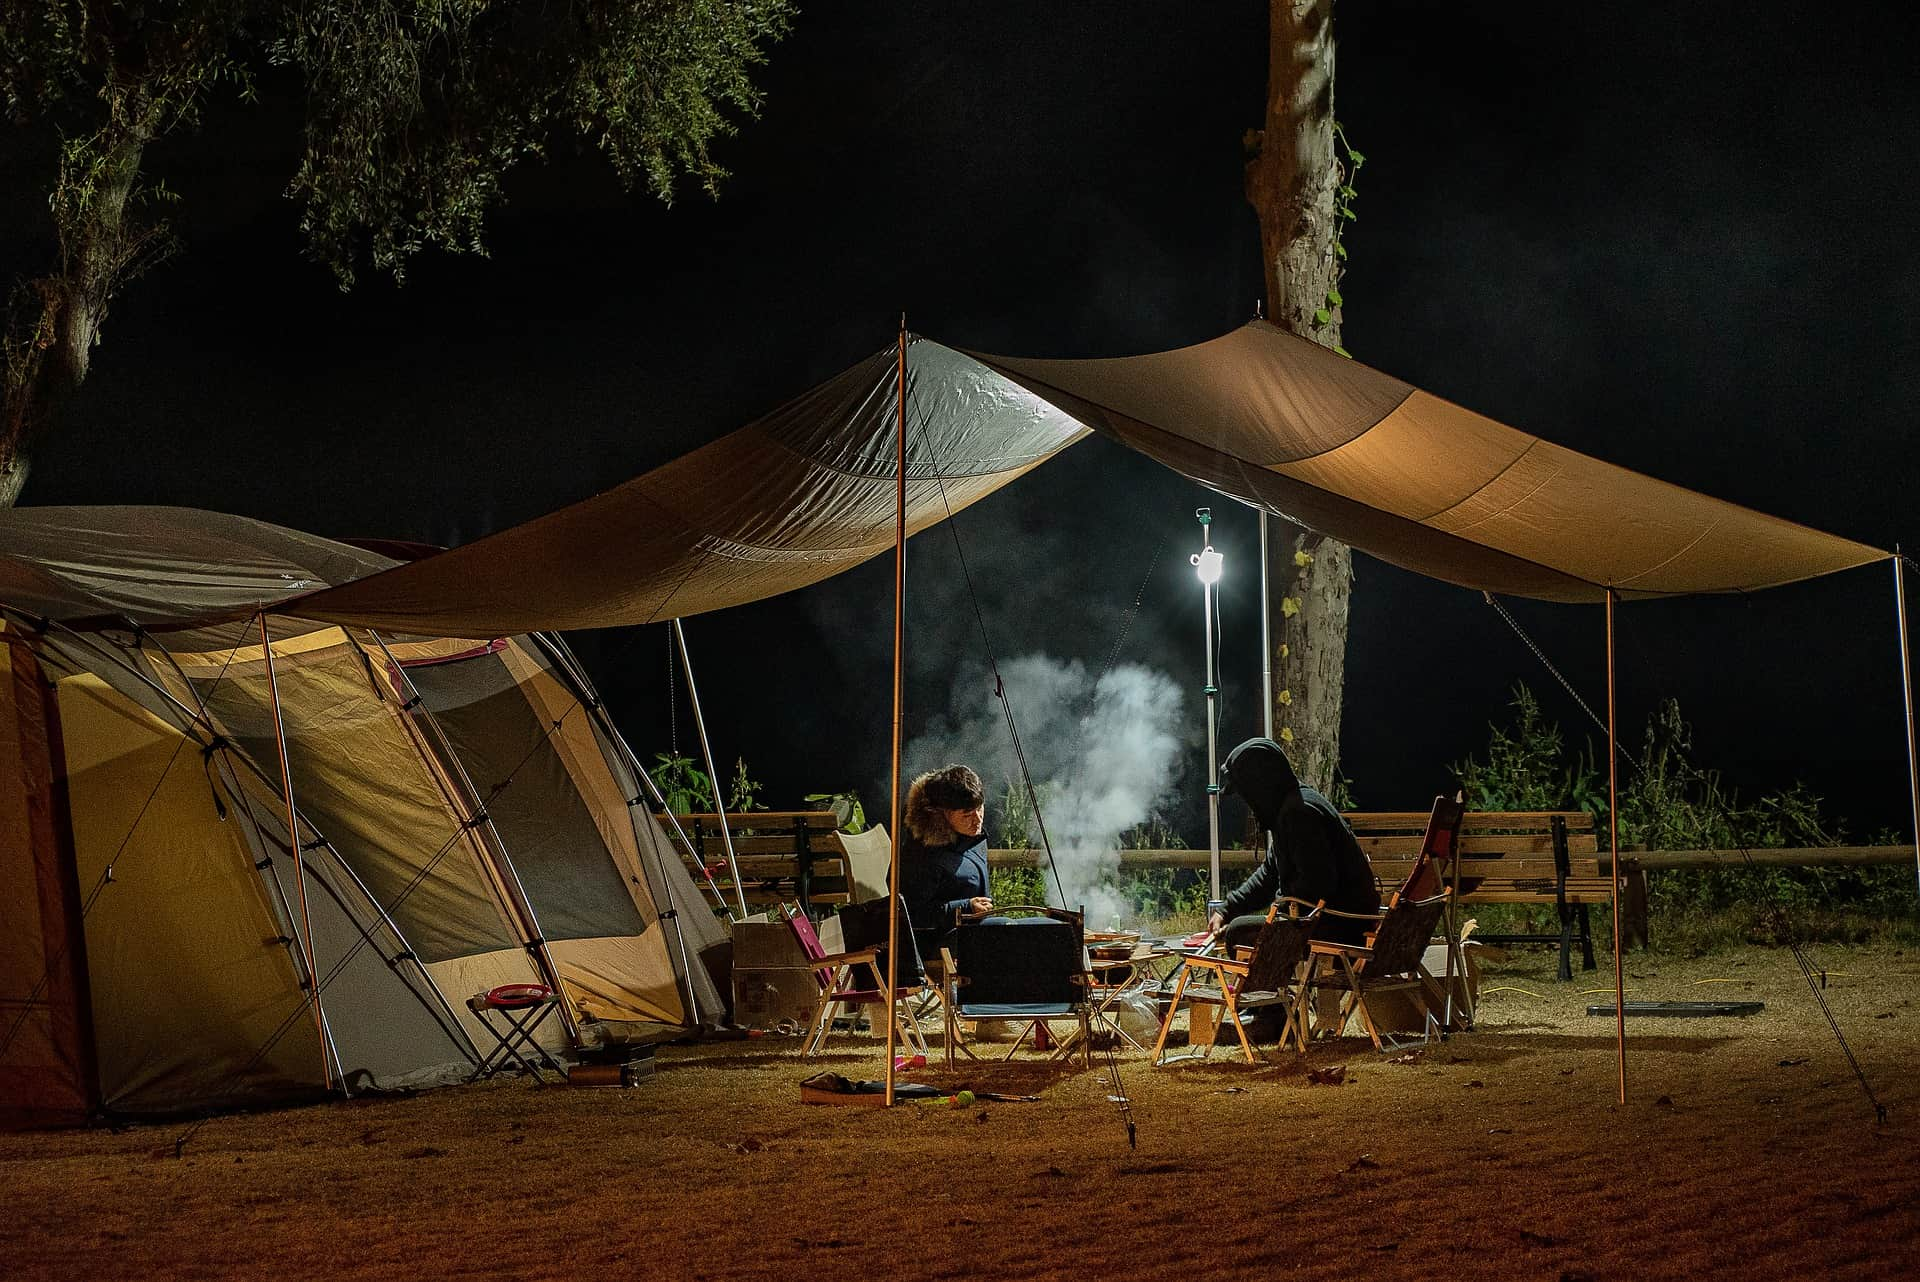 Telttesten – Stor outdoor-guide